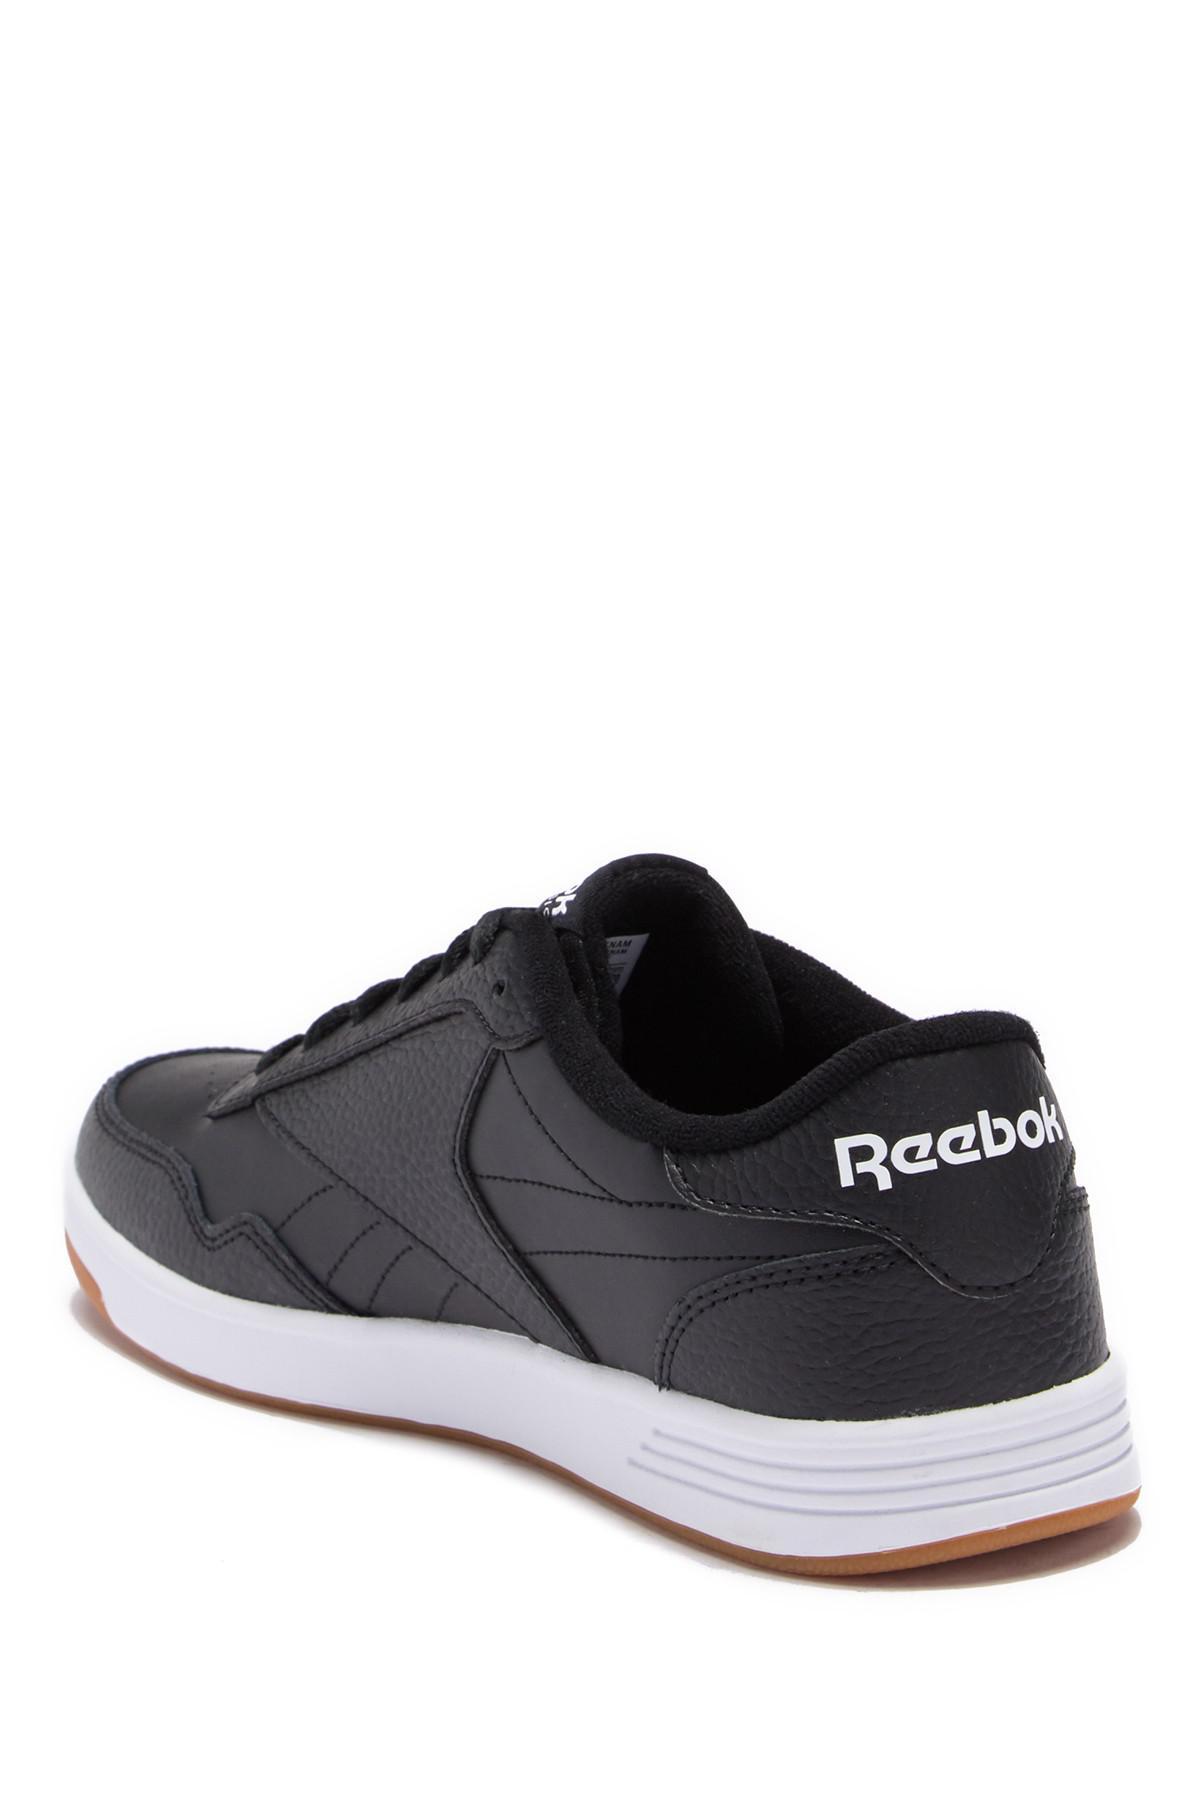 Lyst - Reebok Club Memt Sneaker in Black for Men - Save 23% 6fd94878d0